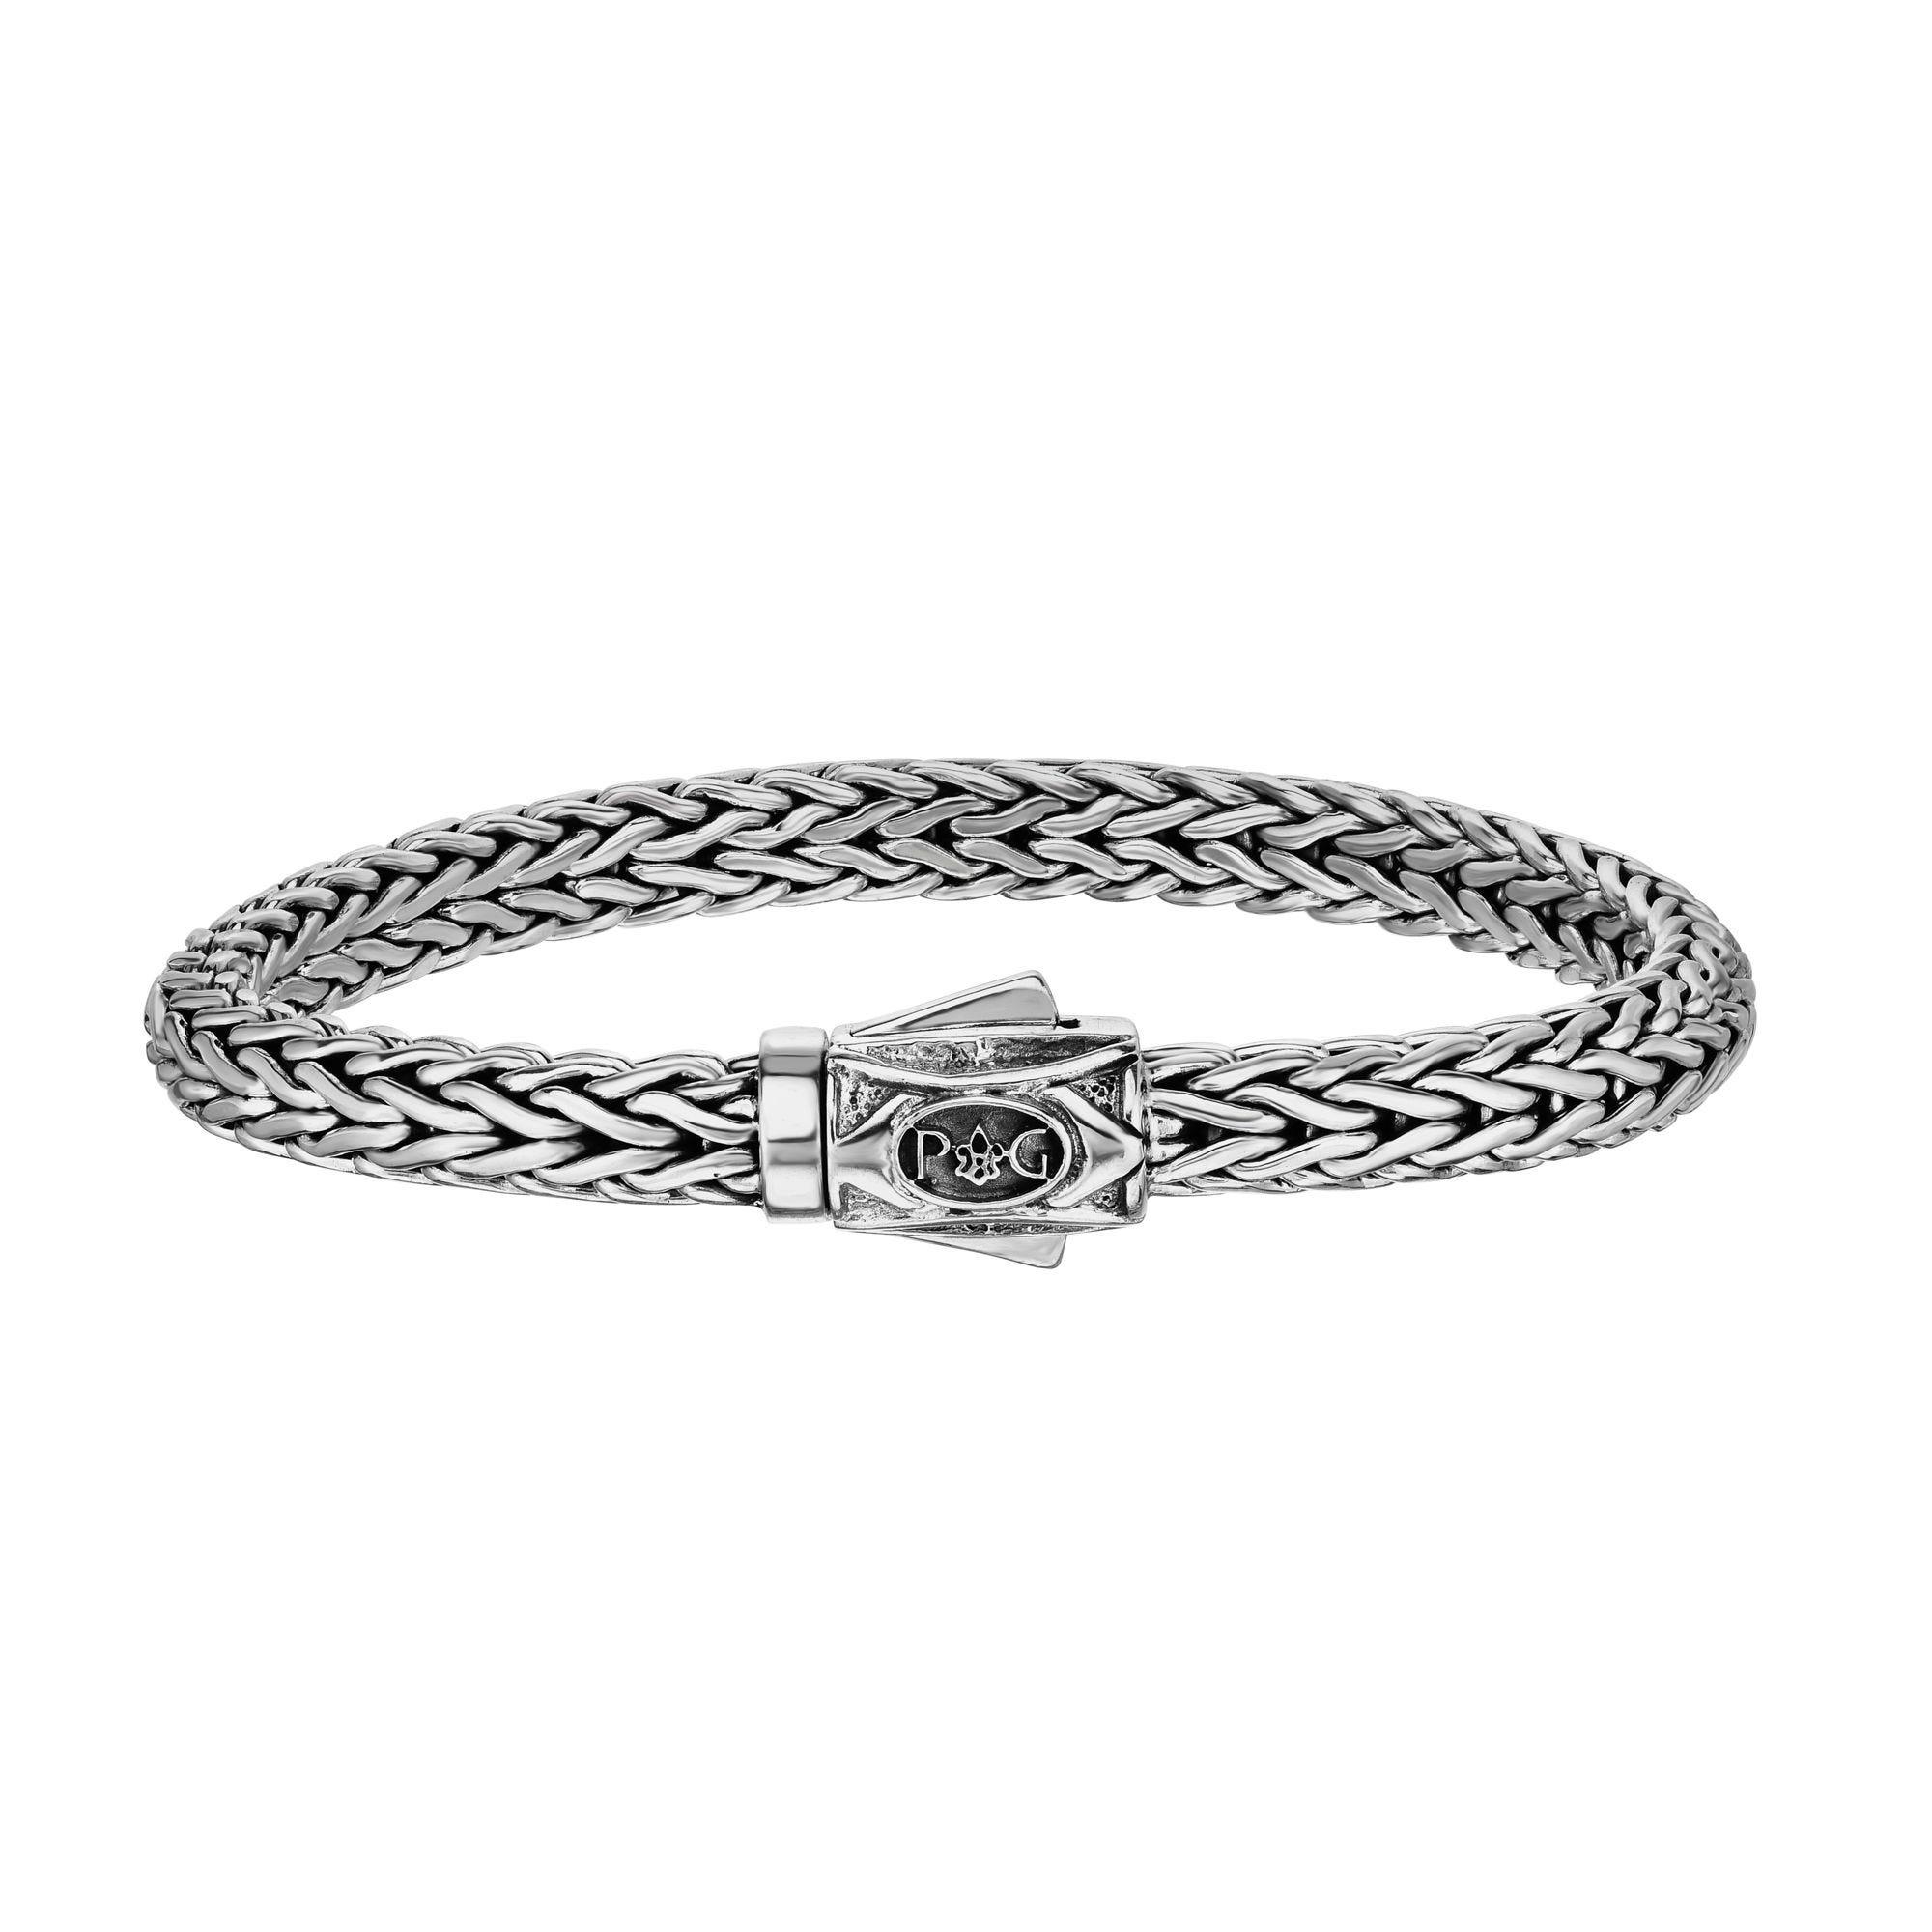 Men's Oxidized Finish Woven Bracelet 7